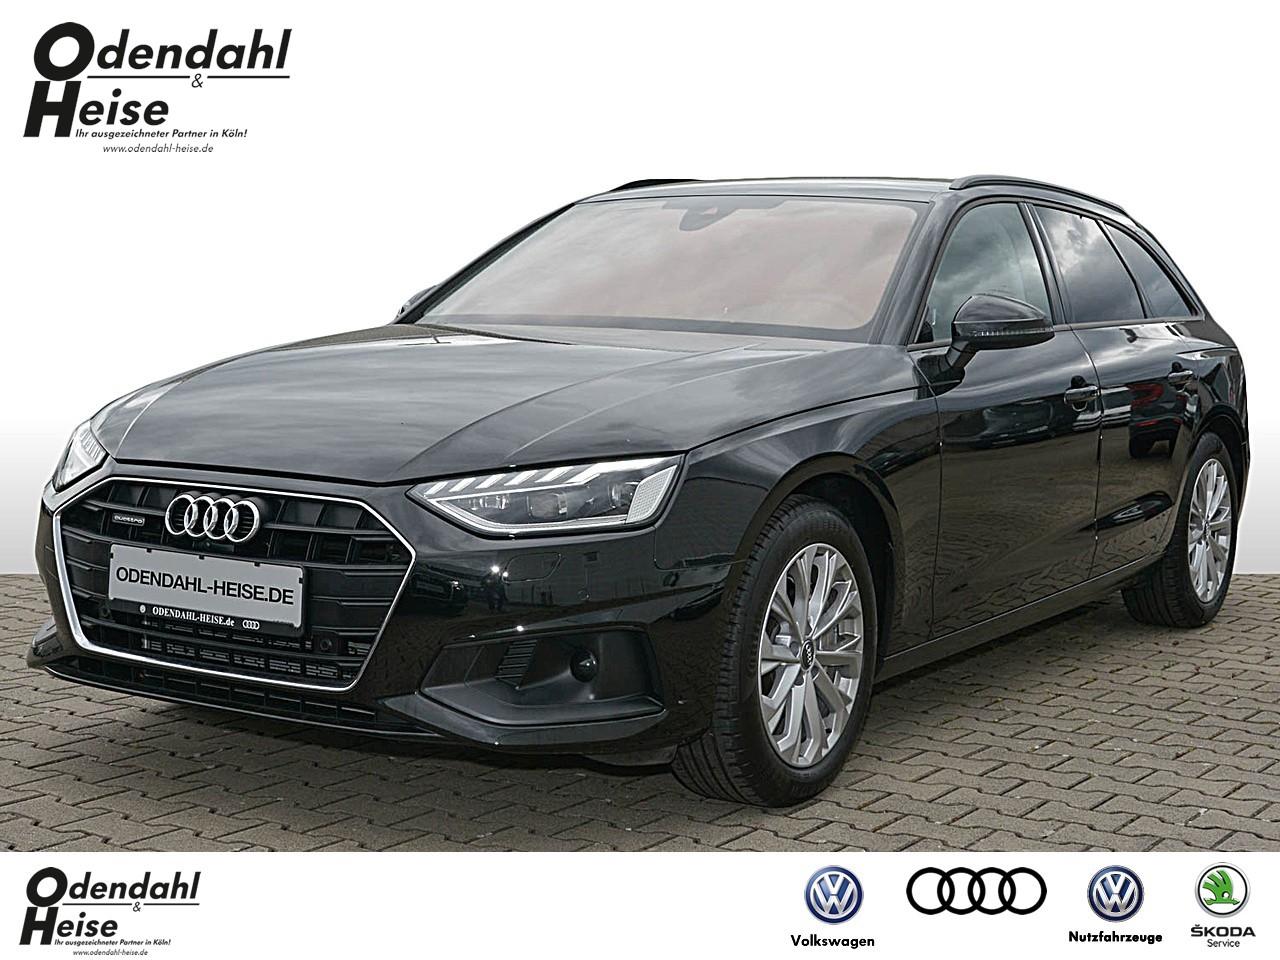 Audi A4 Avant 40 TDI quattro S tronic EU6 advanced, Jahr 2020, Diesel